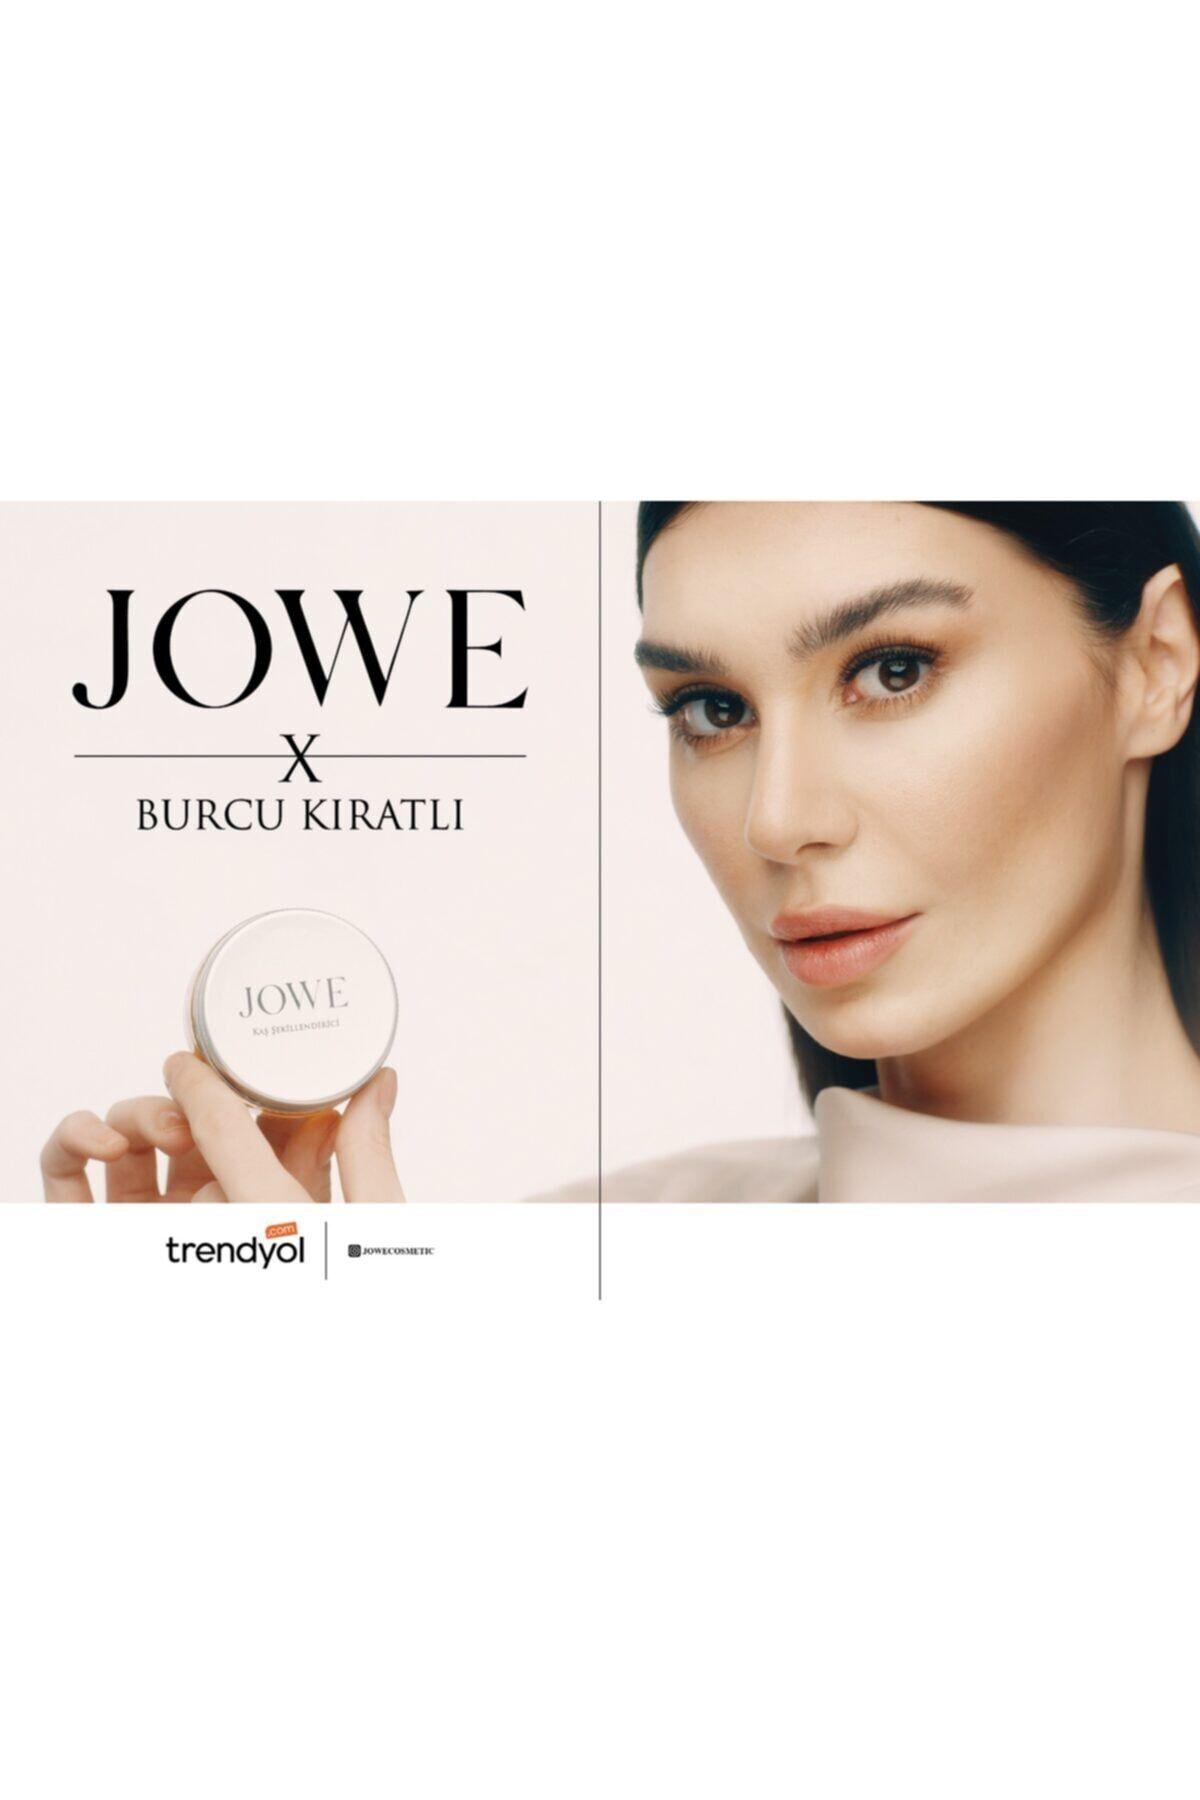 AliExpress Jowe – cire modelante pour les sourcils, kératine, biotine, vitamine E, tenue permanente, efficace